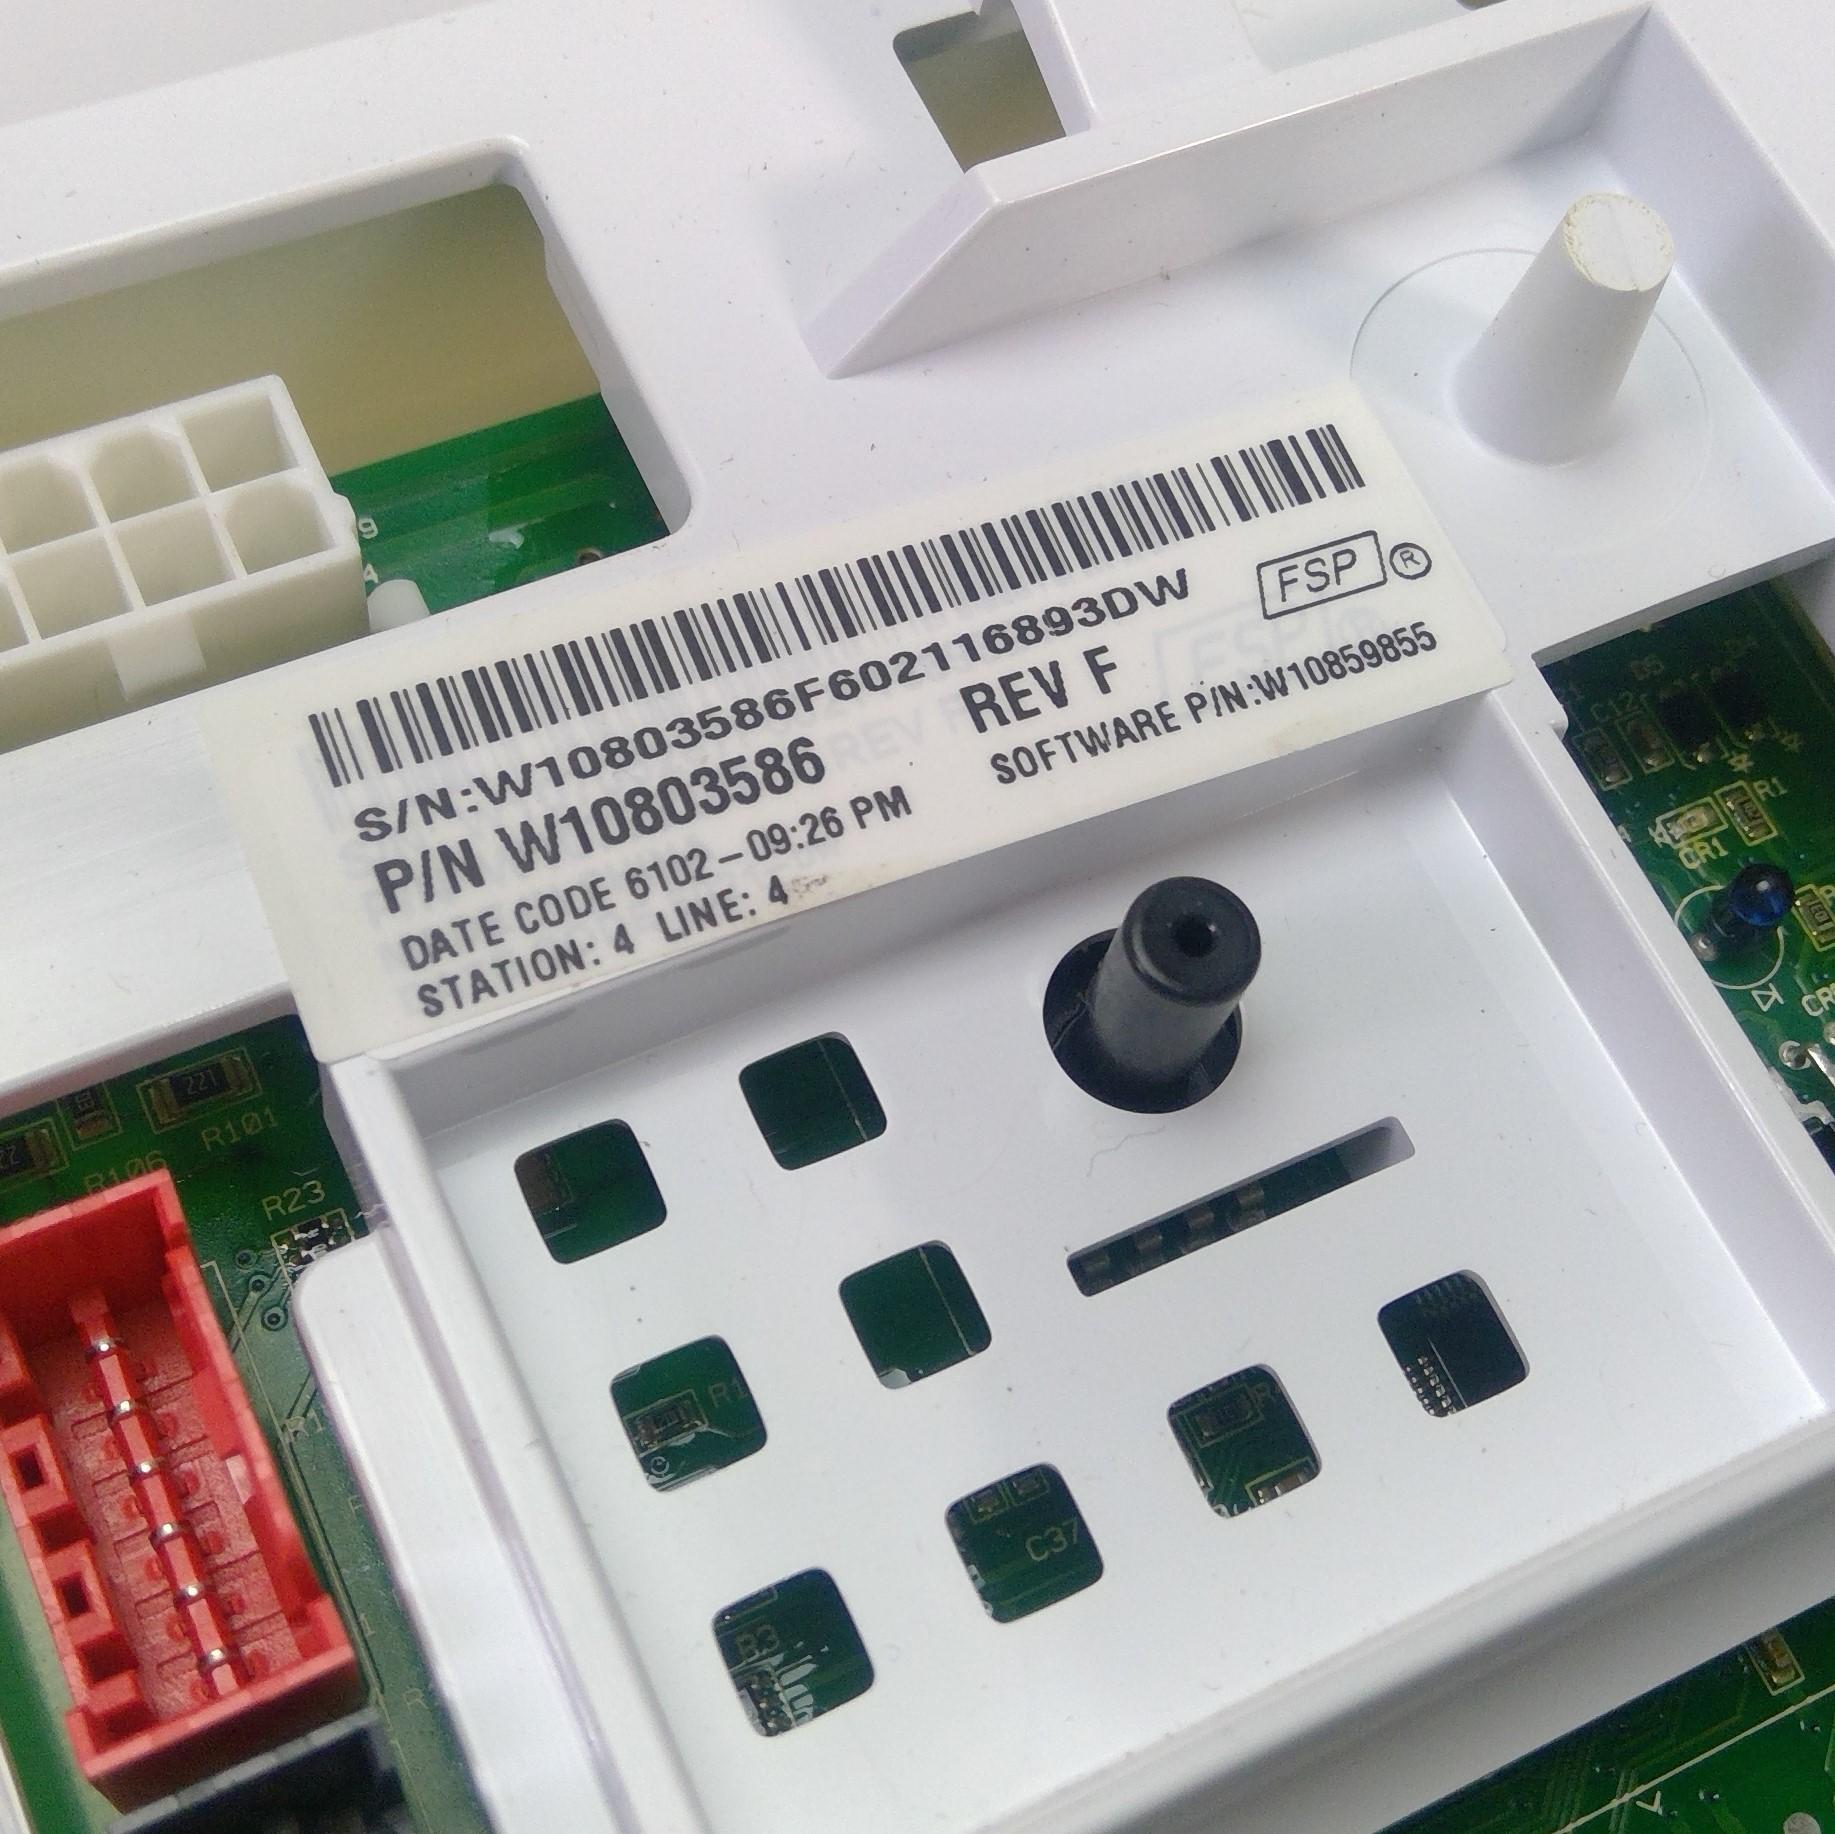 WHIRLPOOL Washing Machine MAIN CONTROL BOARD W10803586